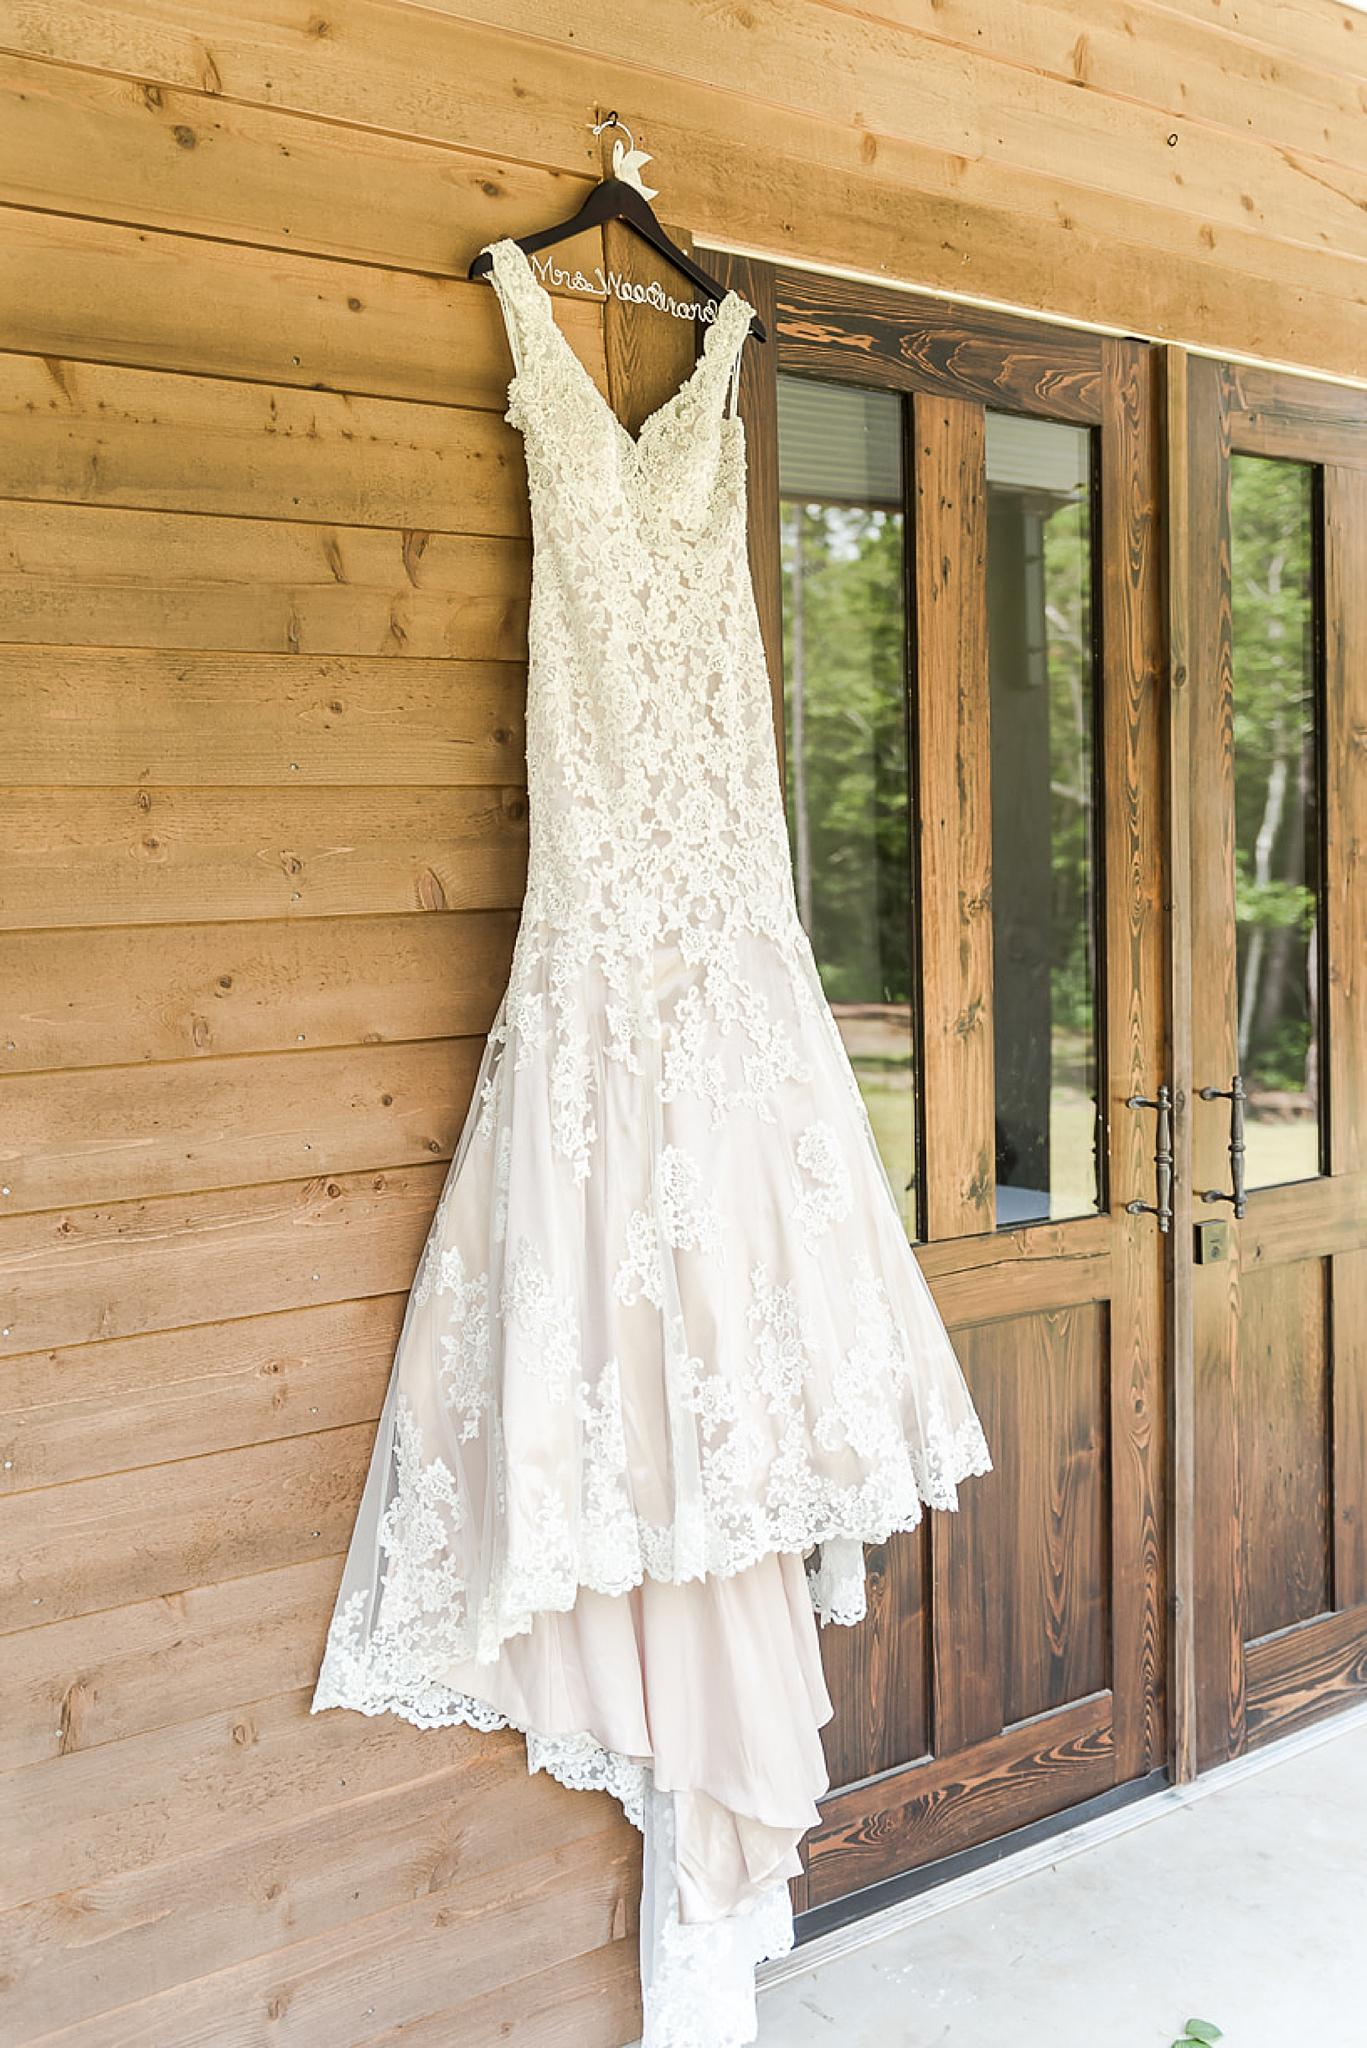 bride's dress hangs at Izenstone in Spanish Fort AL